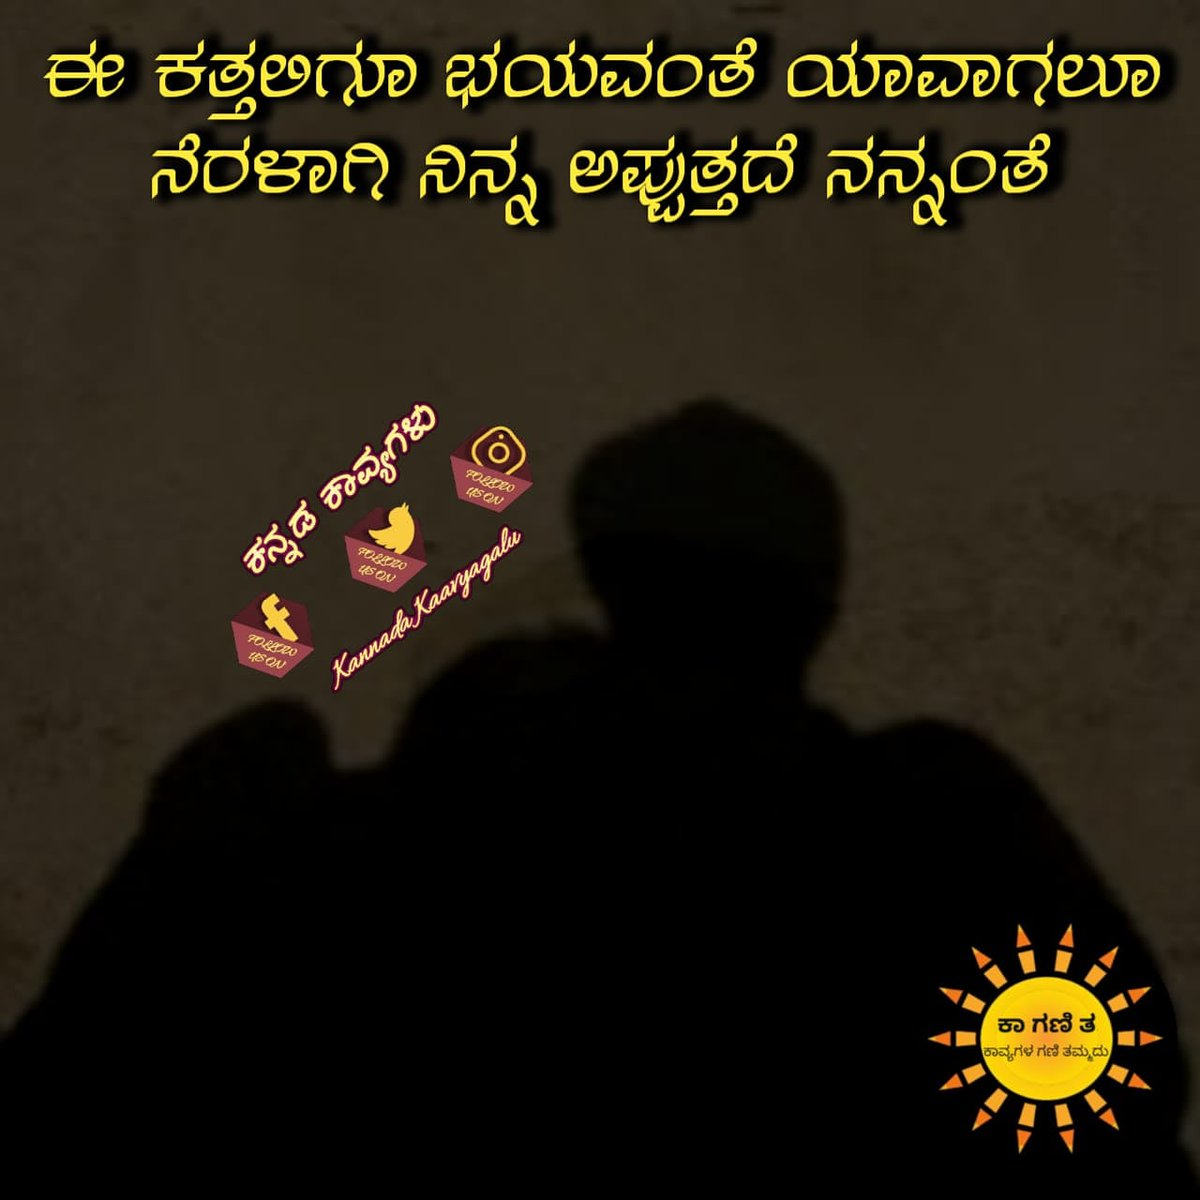 #kannada #KannadaNews #kannada_film_industry #kannadigas #poem #kannadaquotes #kannadakaavyagalu #kannadakavanagalu #KGFChapter2 #KGF #druva_sarja #DBoss #KicchaSudeeppic.twitter.com/mNv0RahiSb